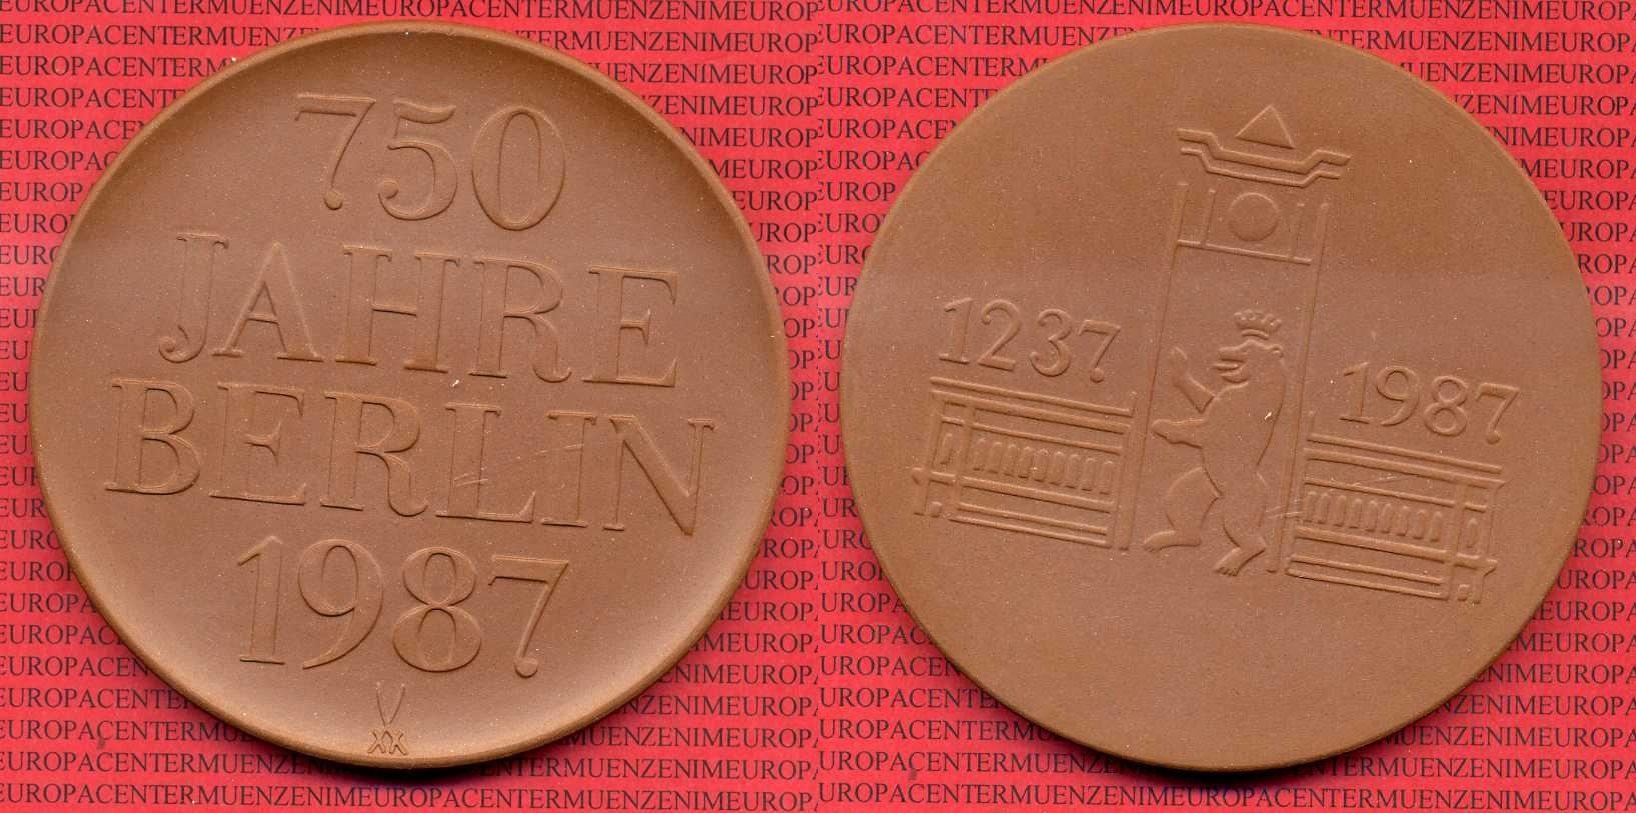 Porzellanmedaille Braun 1987 Ddr Ddr Porzellanmedaille 1987 750